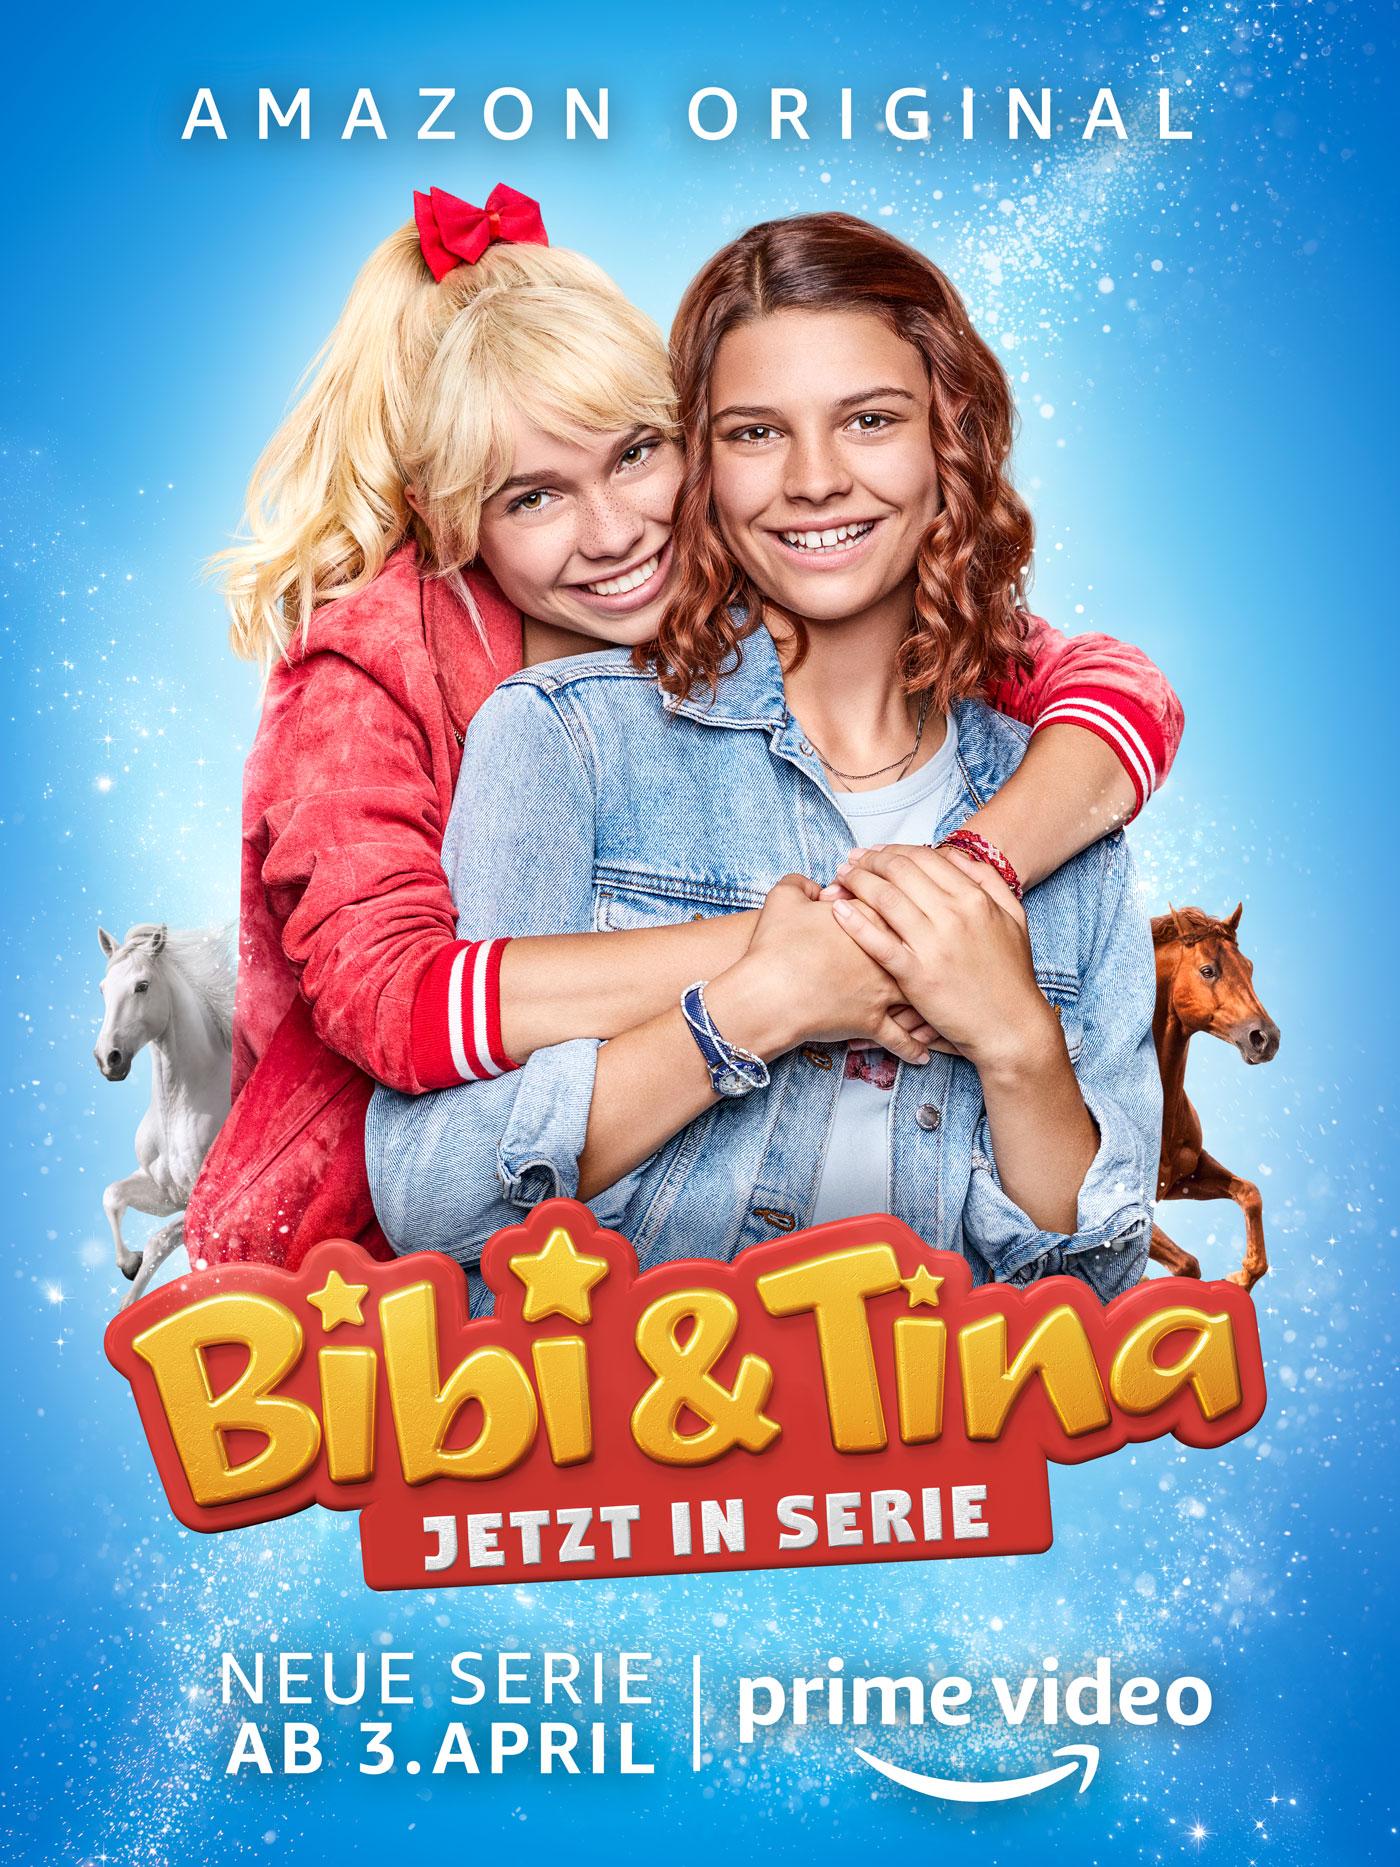 Bibi Und Tina Amazon